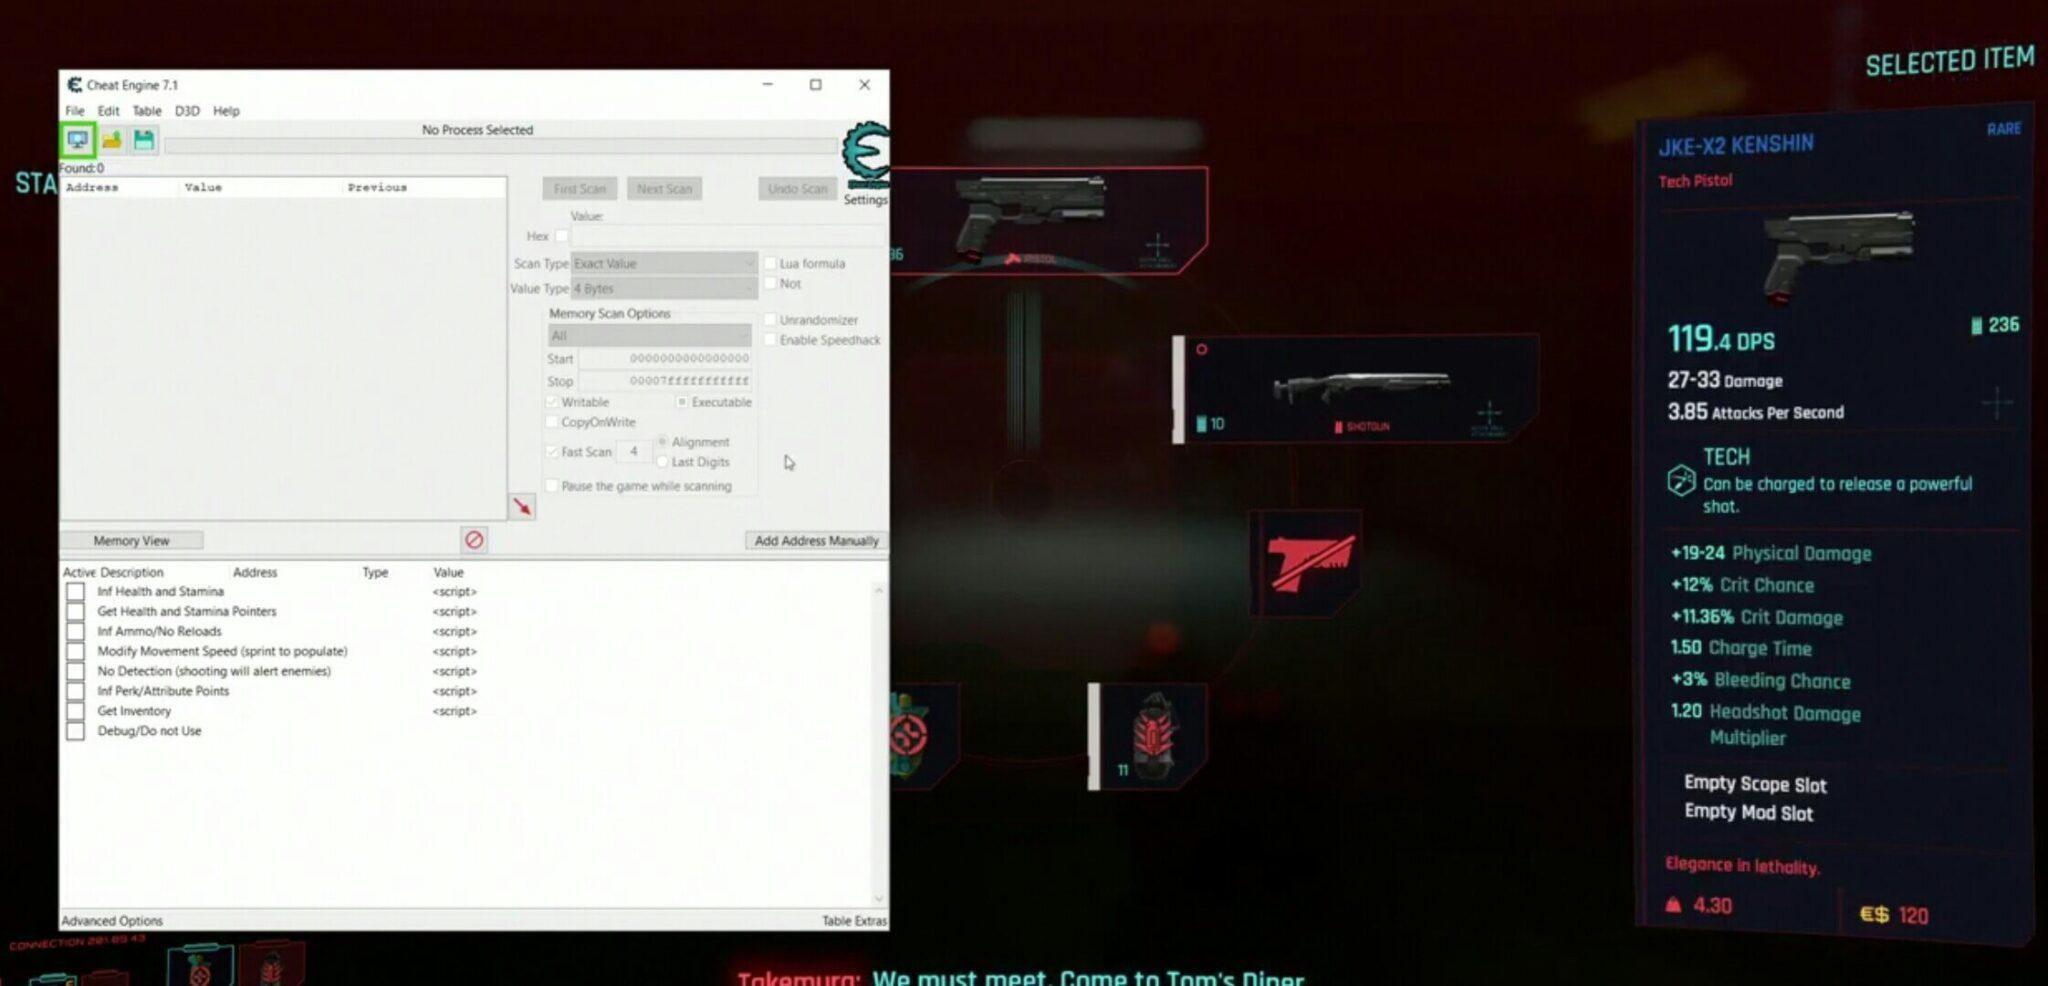 cyberpunk-2077-cheat-engine